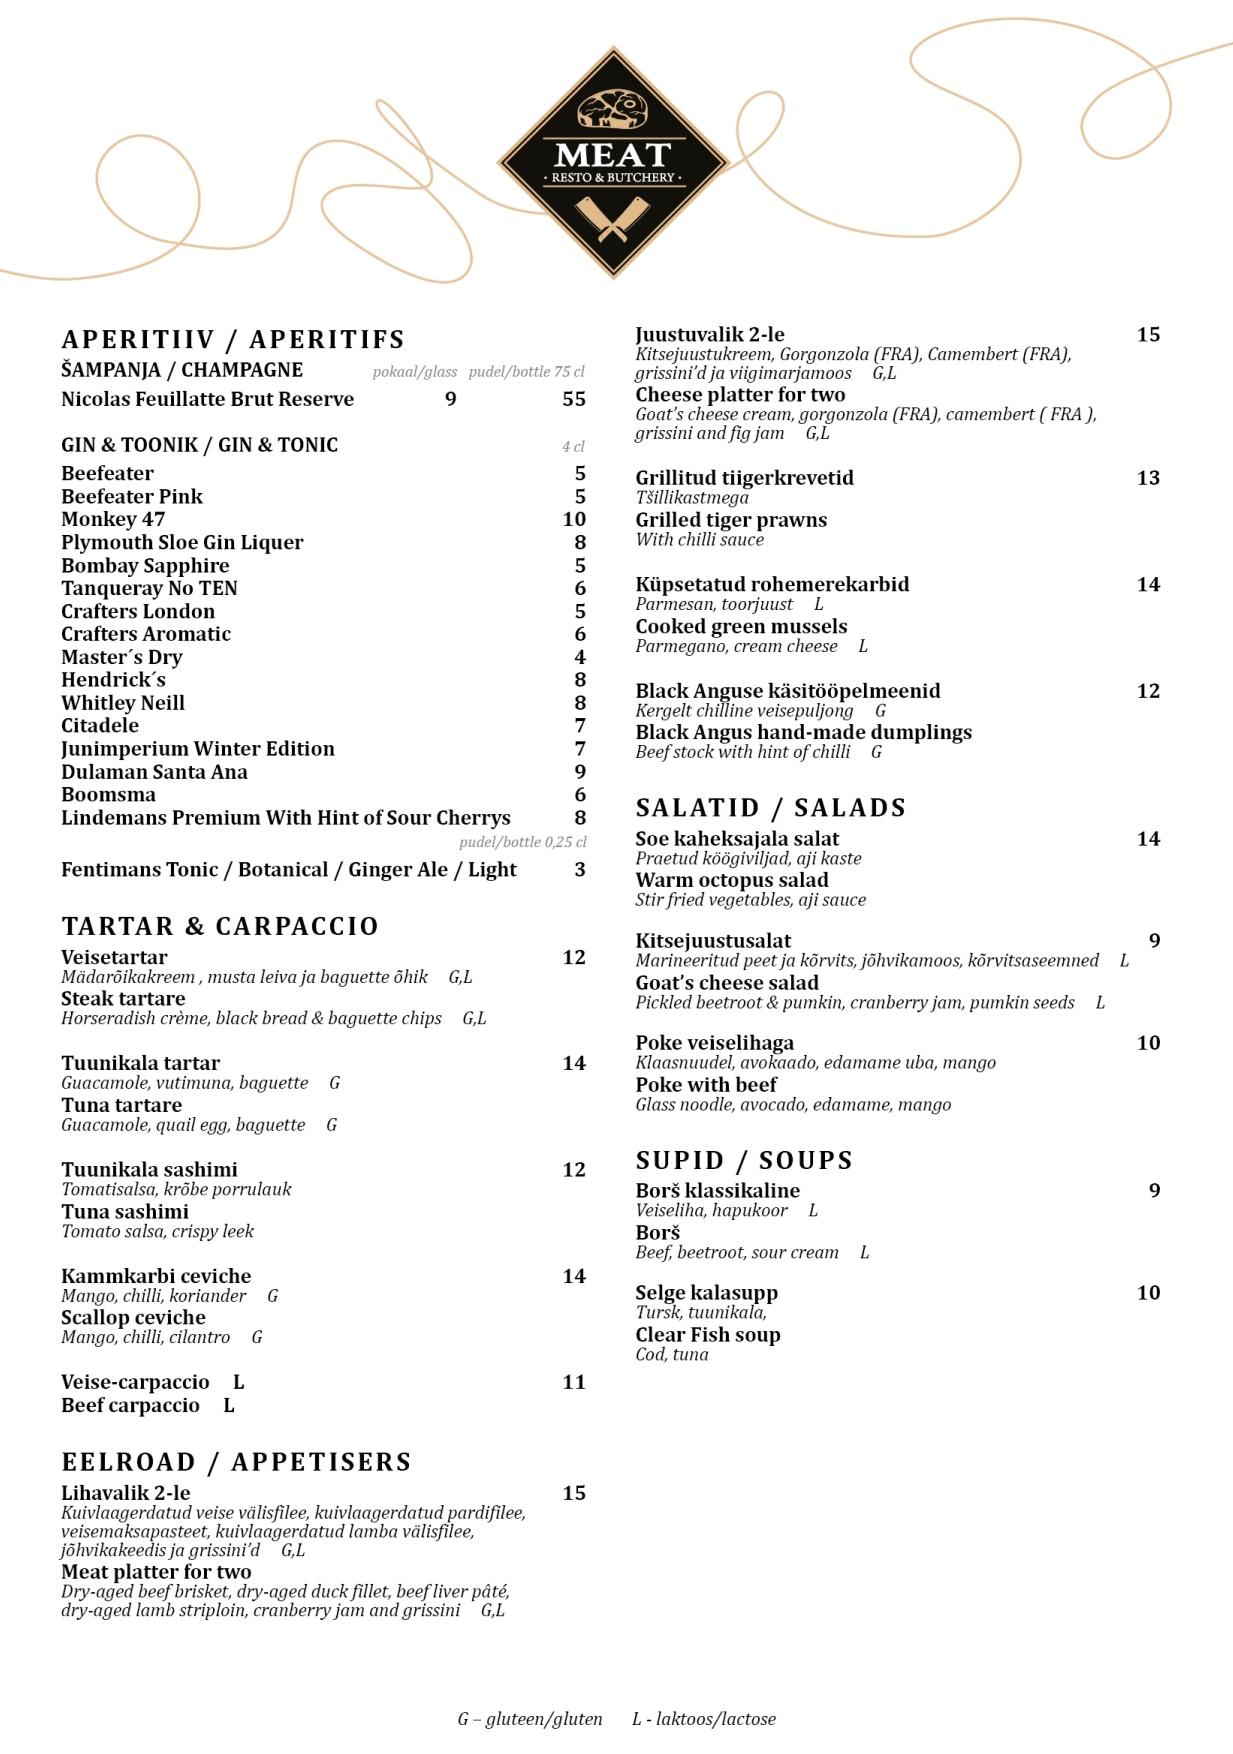 MEAT Resto & Butchery menu 5/5